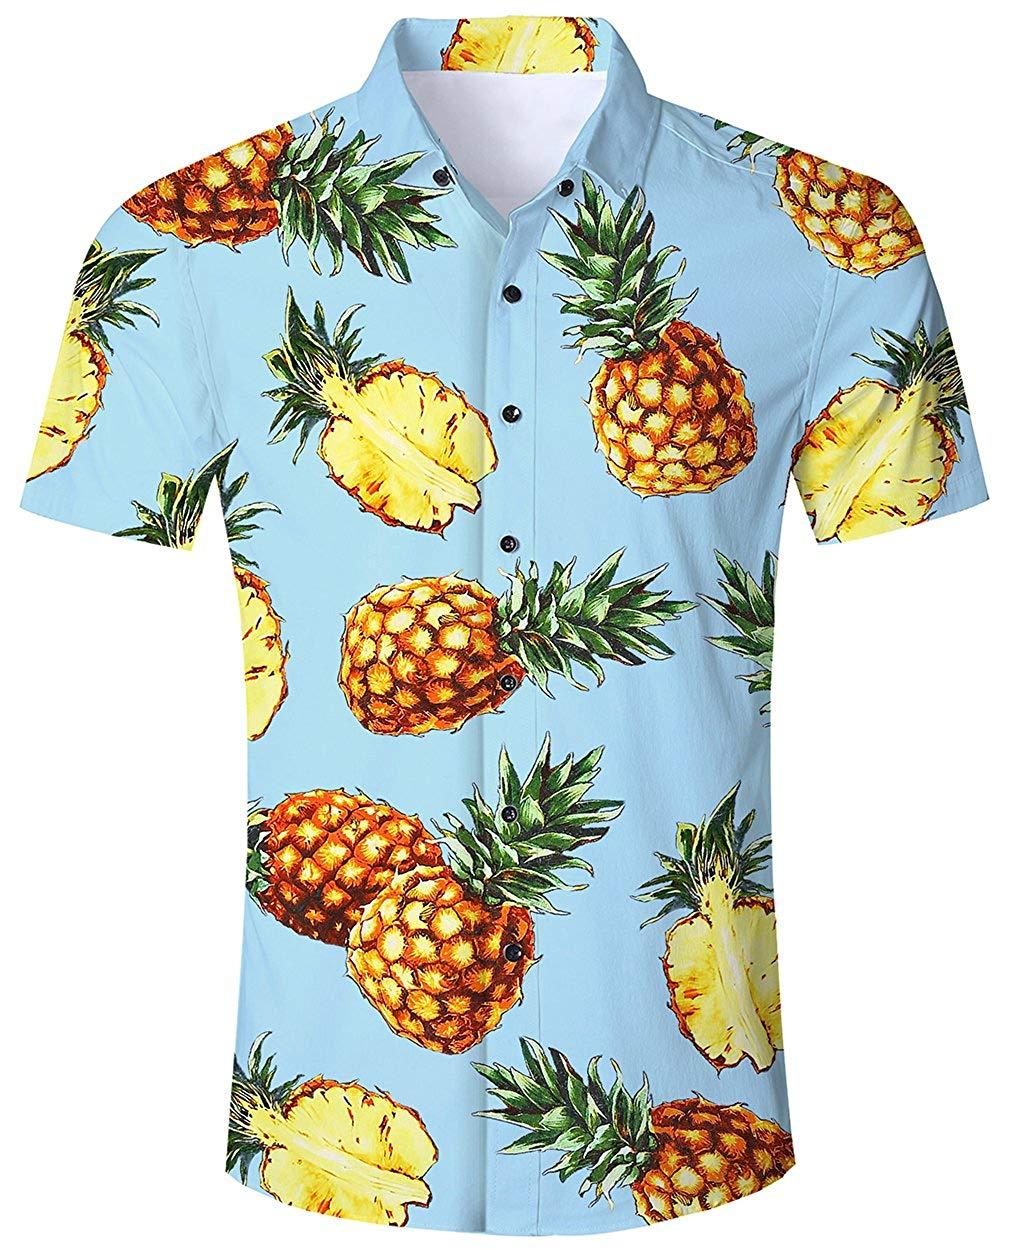 f859549f8c42 Camisa Hawaiana para Hombre Mujer Casual Manga Corta Camisas Playa Verano  Unisex 3D Estampada Funny Hawaii